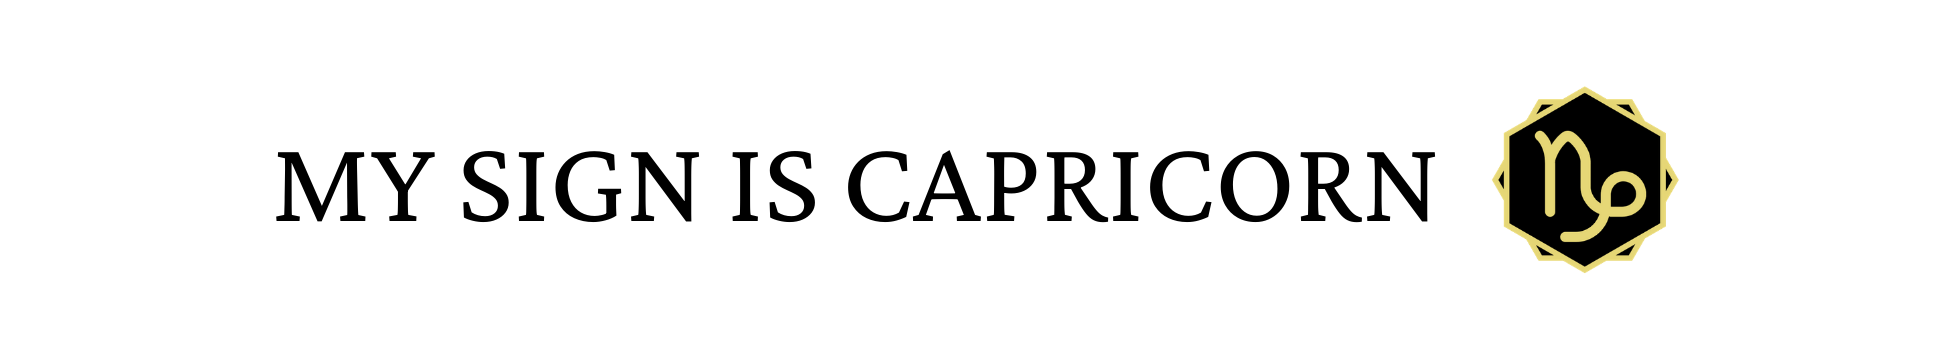 My Sign Is Capricorn